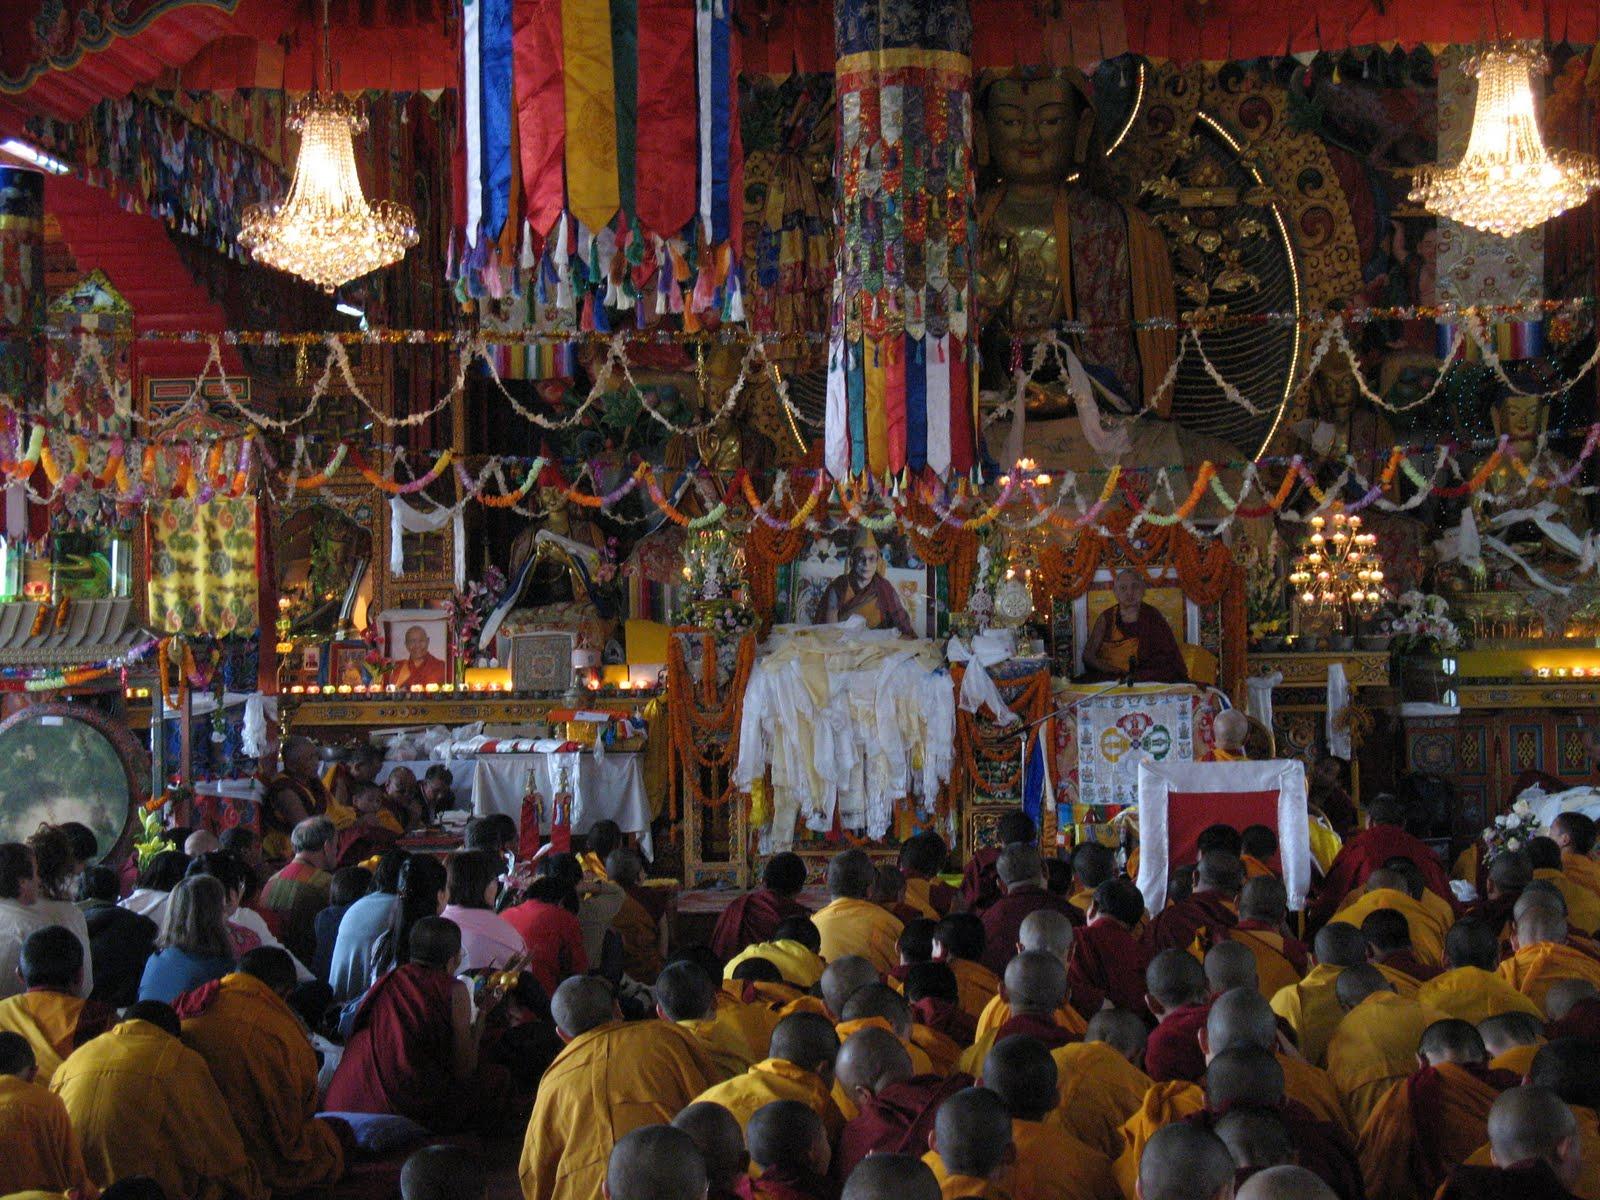 Long life puja at Kopan Monastery, December, 2008.